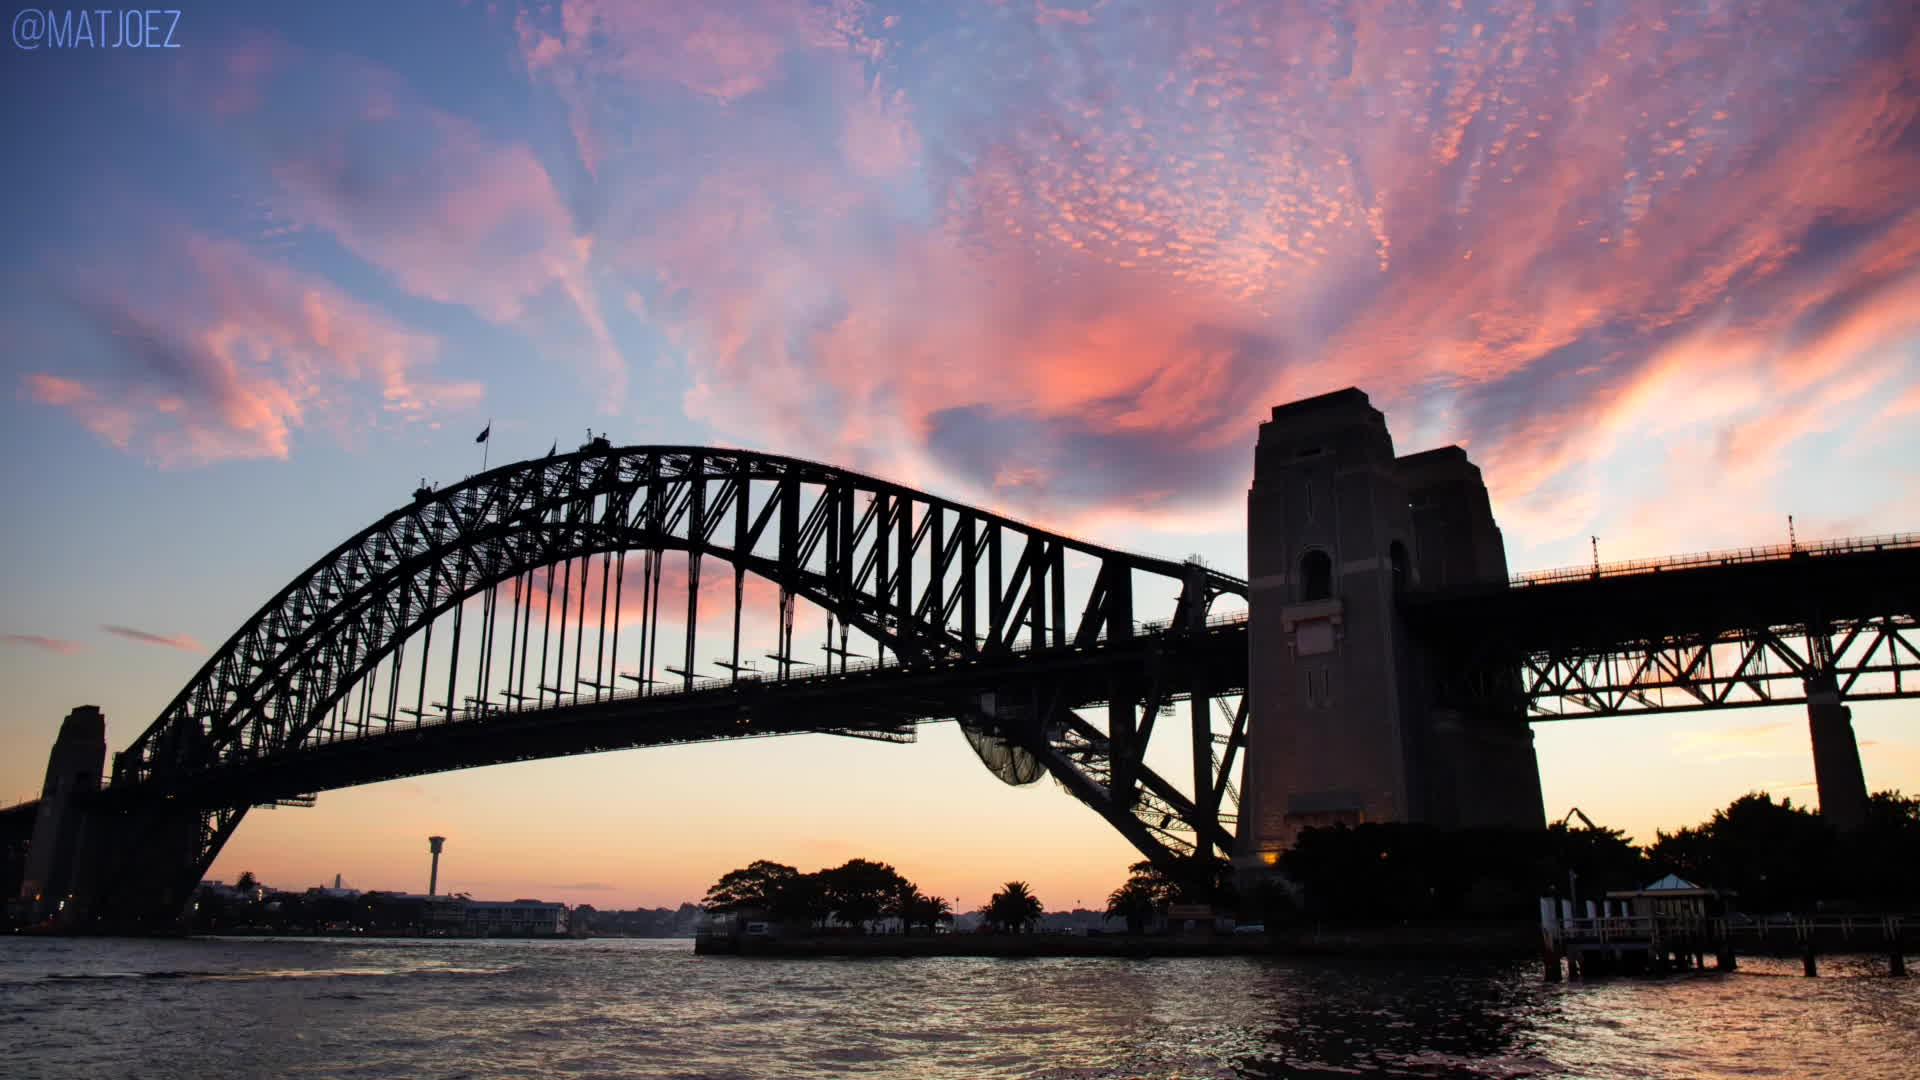 Sunset in Sydney GIFs